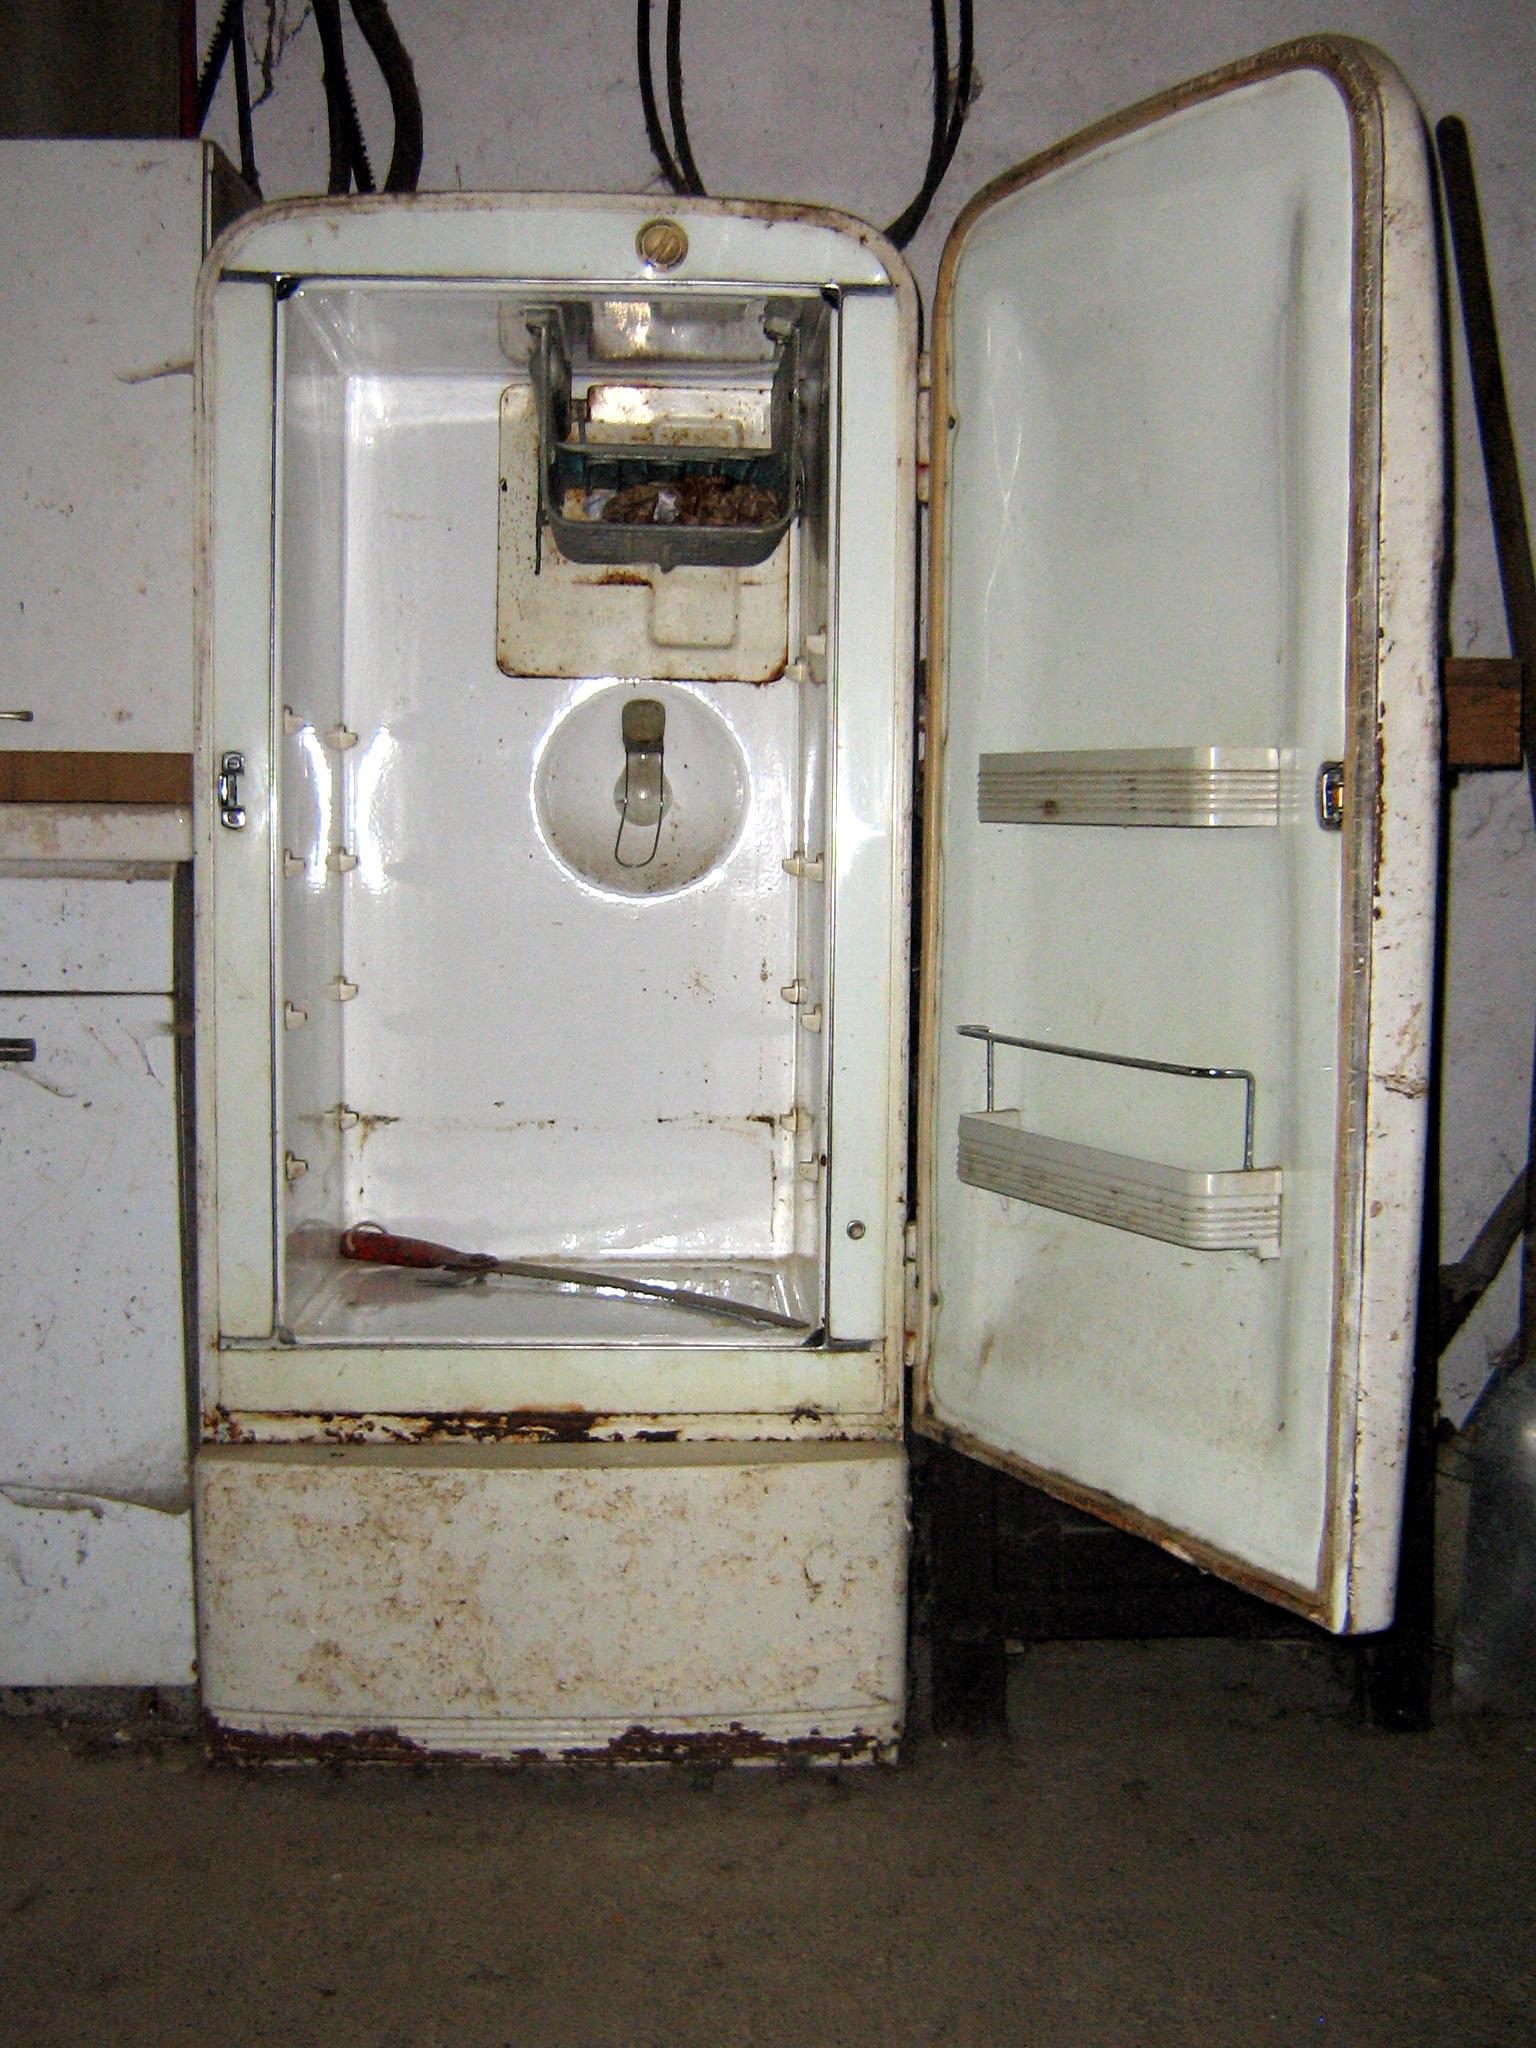 Refrigerator 2 by Alberto-stock